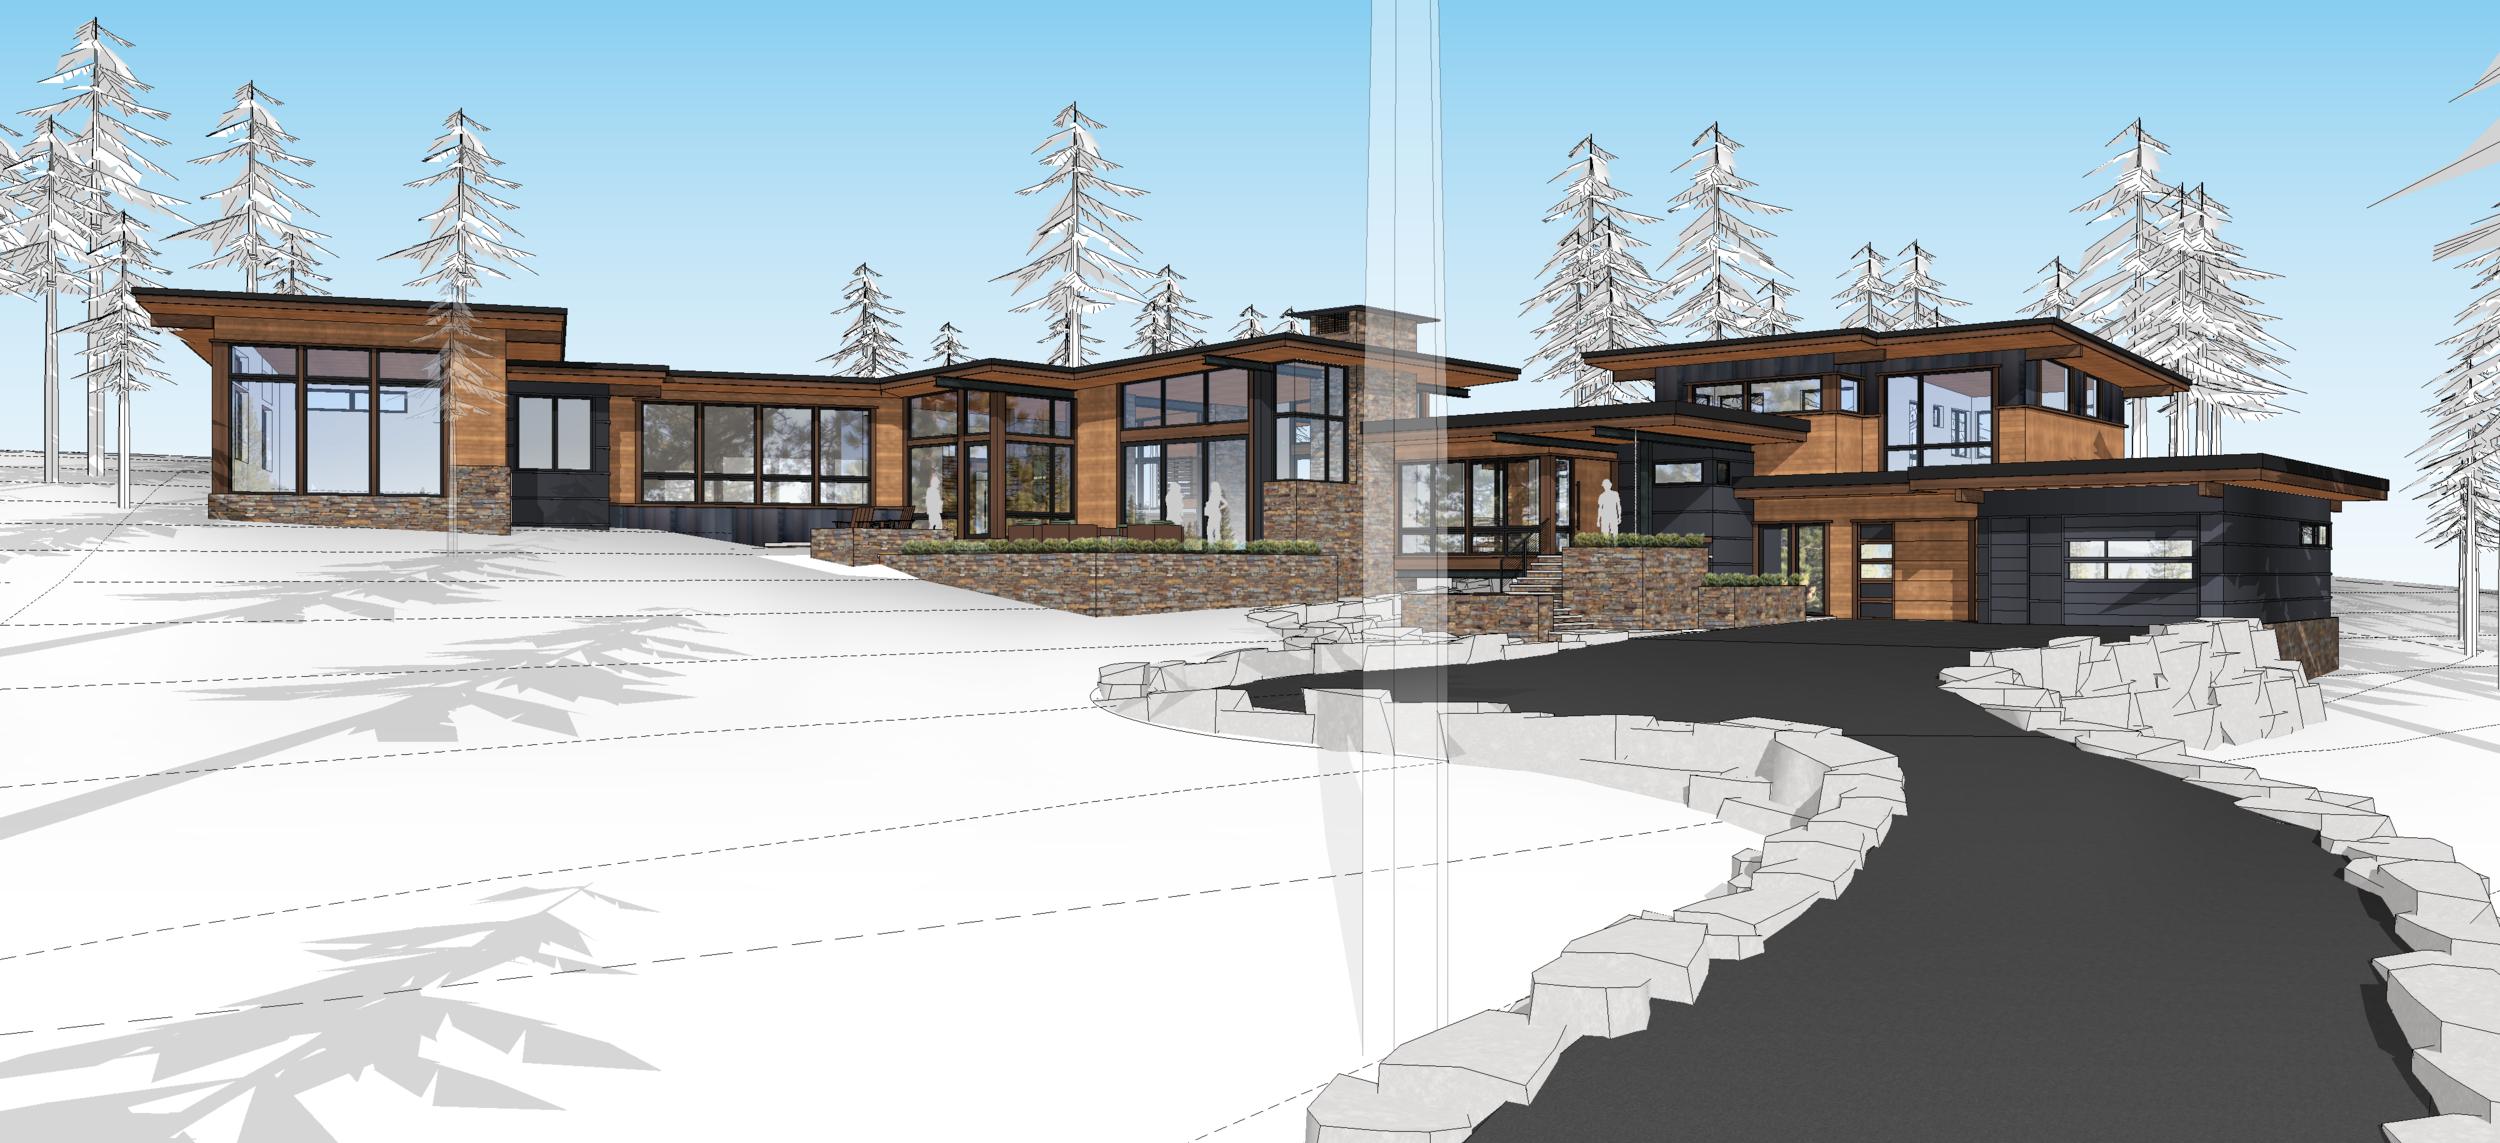 Contractor: TBD   Square Footage: 4,420sf bedrooms: 3 bathrooms: 3.5